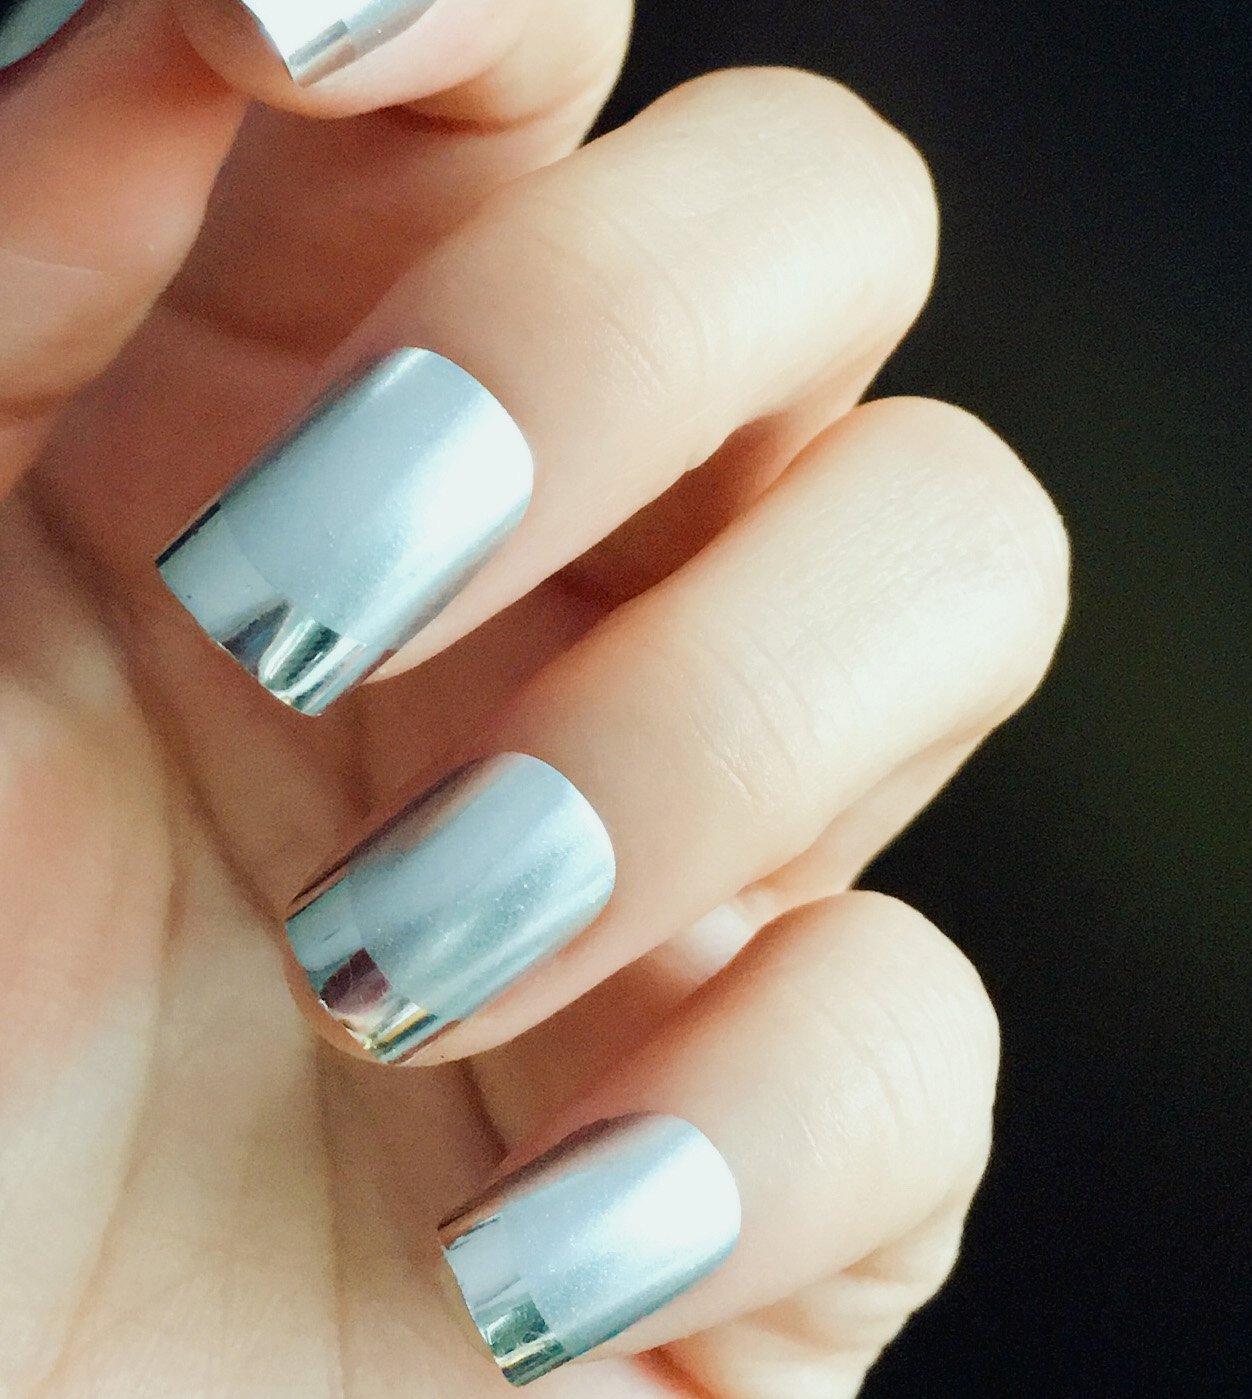 Amazon.com : Fake Nails False Nail Design Pretty Nail Designs Matte White with Silver Fake Nails : Beauty